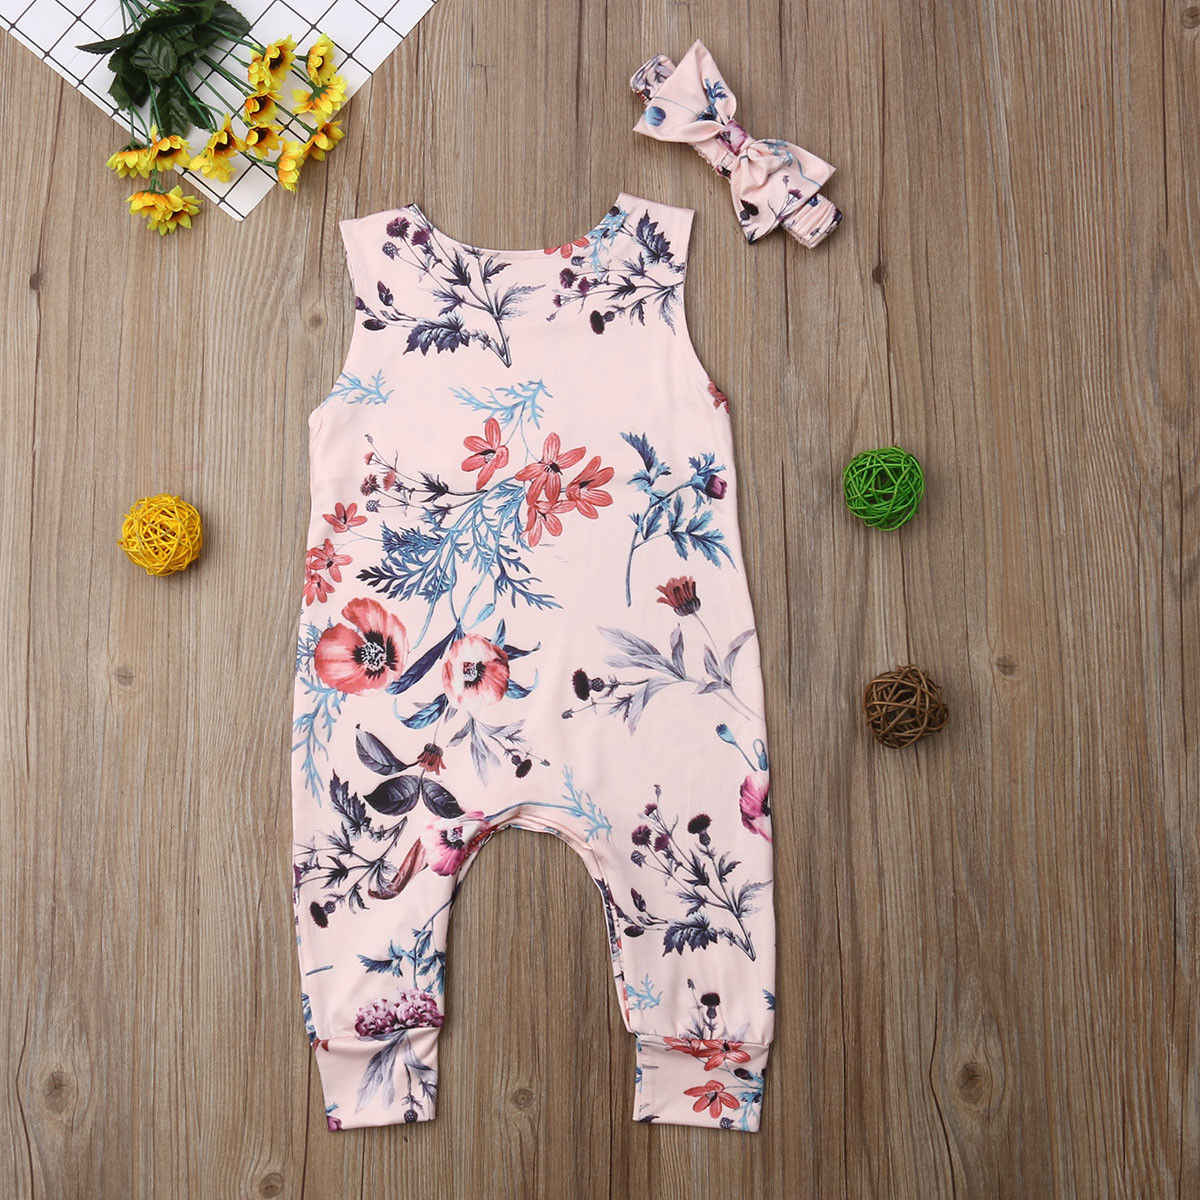 2019 UK Bayi Bayi Gadis Floral Bodysuit Jumpsuit Pakaian Pakaian Set Headband 1 Pcs Bodysuit Jumpsuit 0-24M bayi Baju Monyet